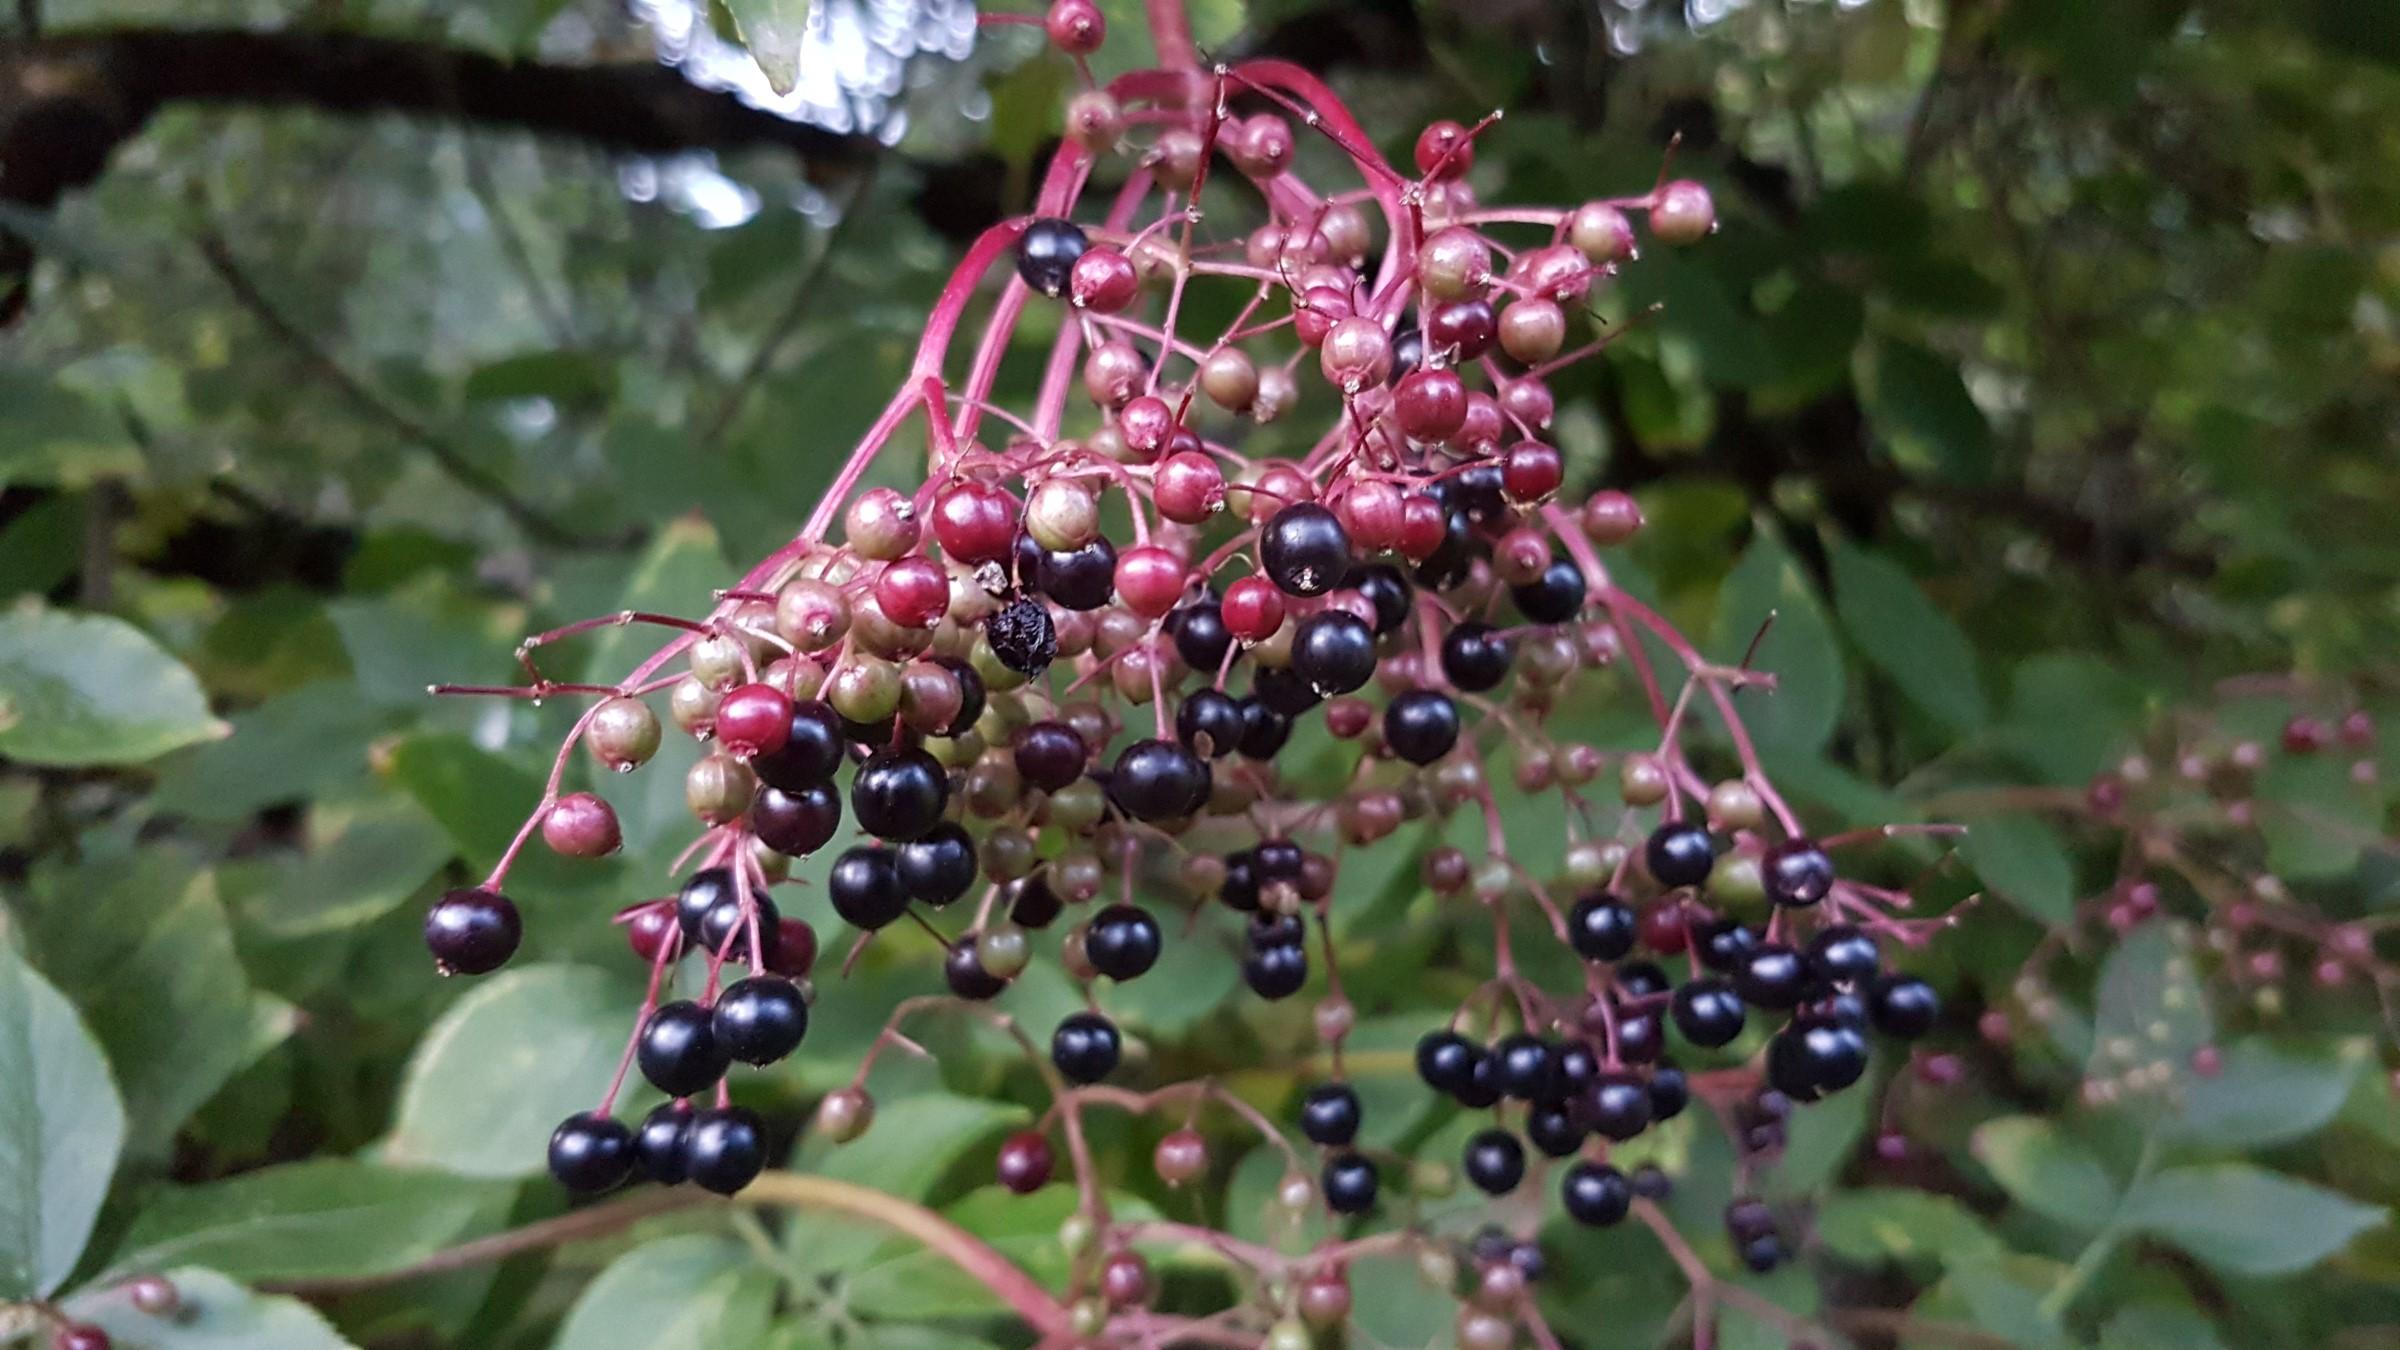 Blåsvarte, ertestore bær og mørkegrønne blader.